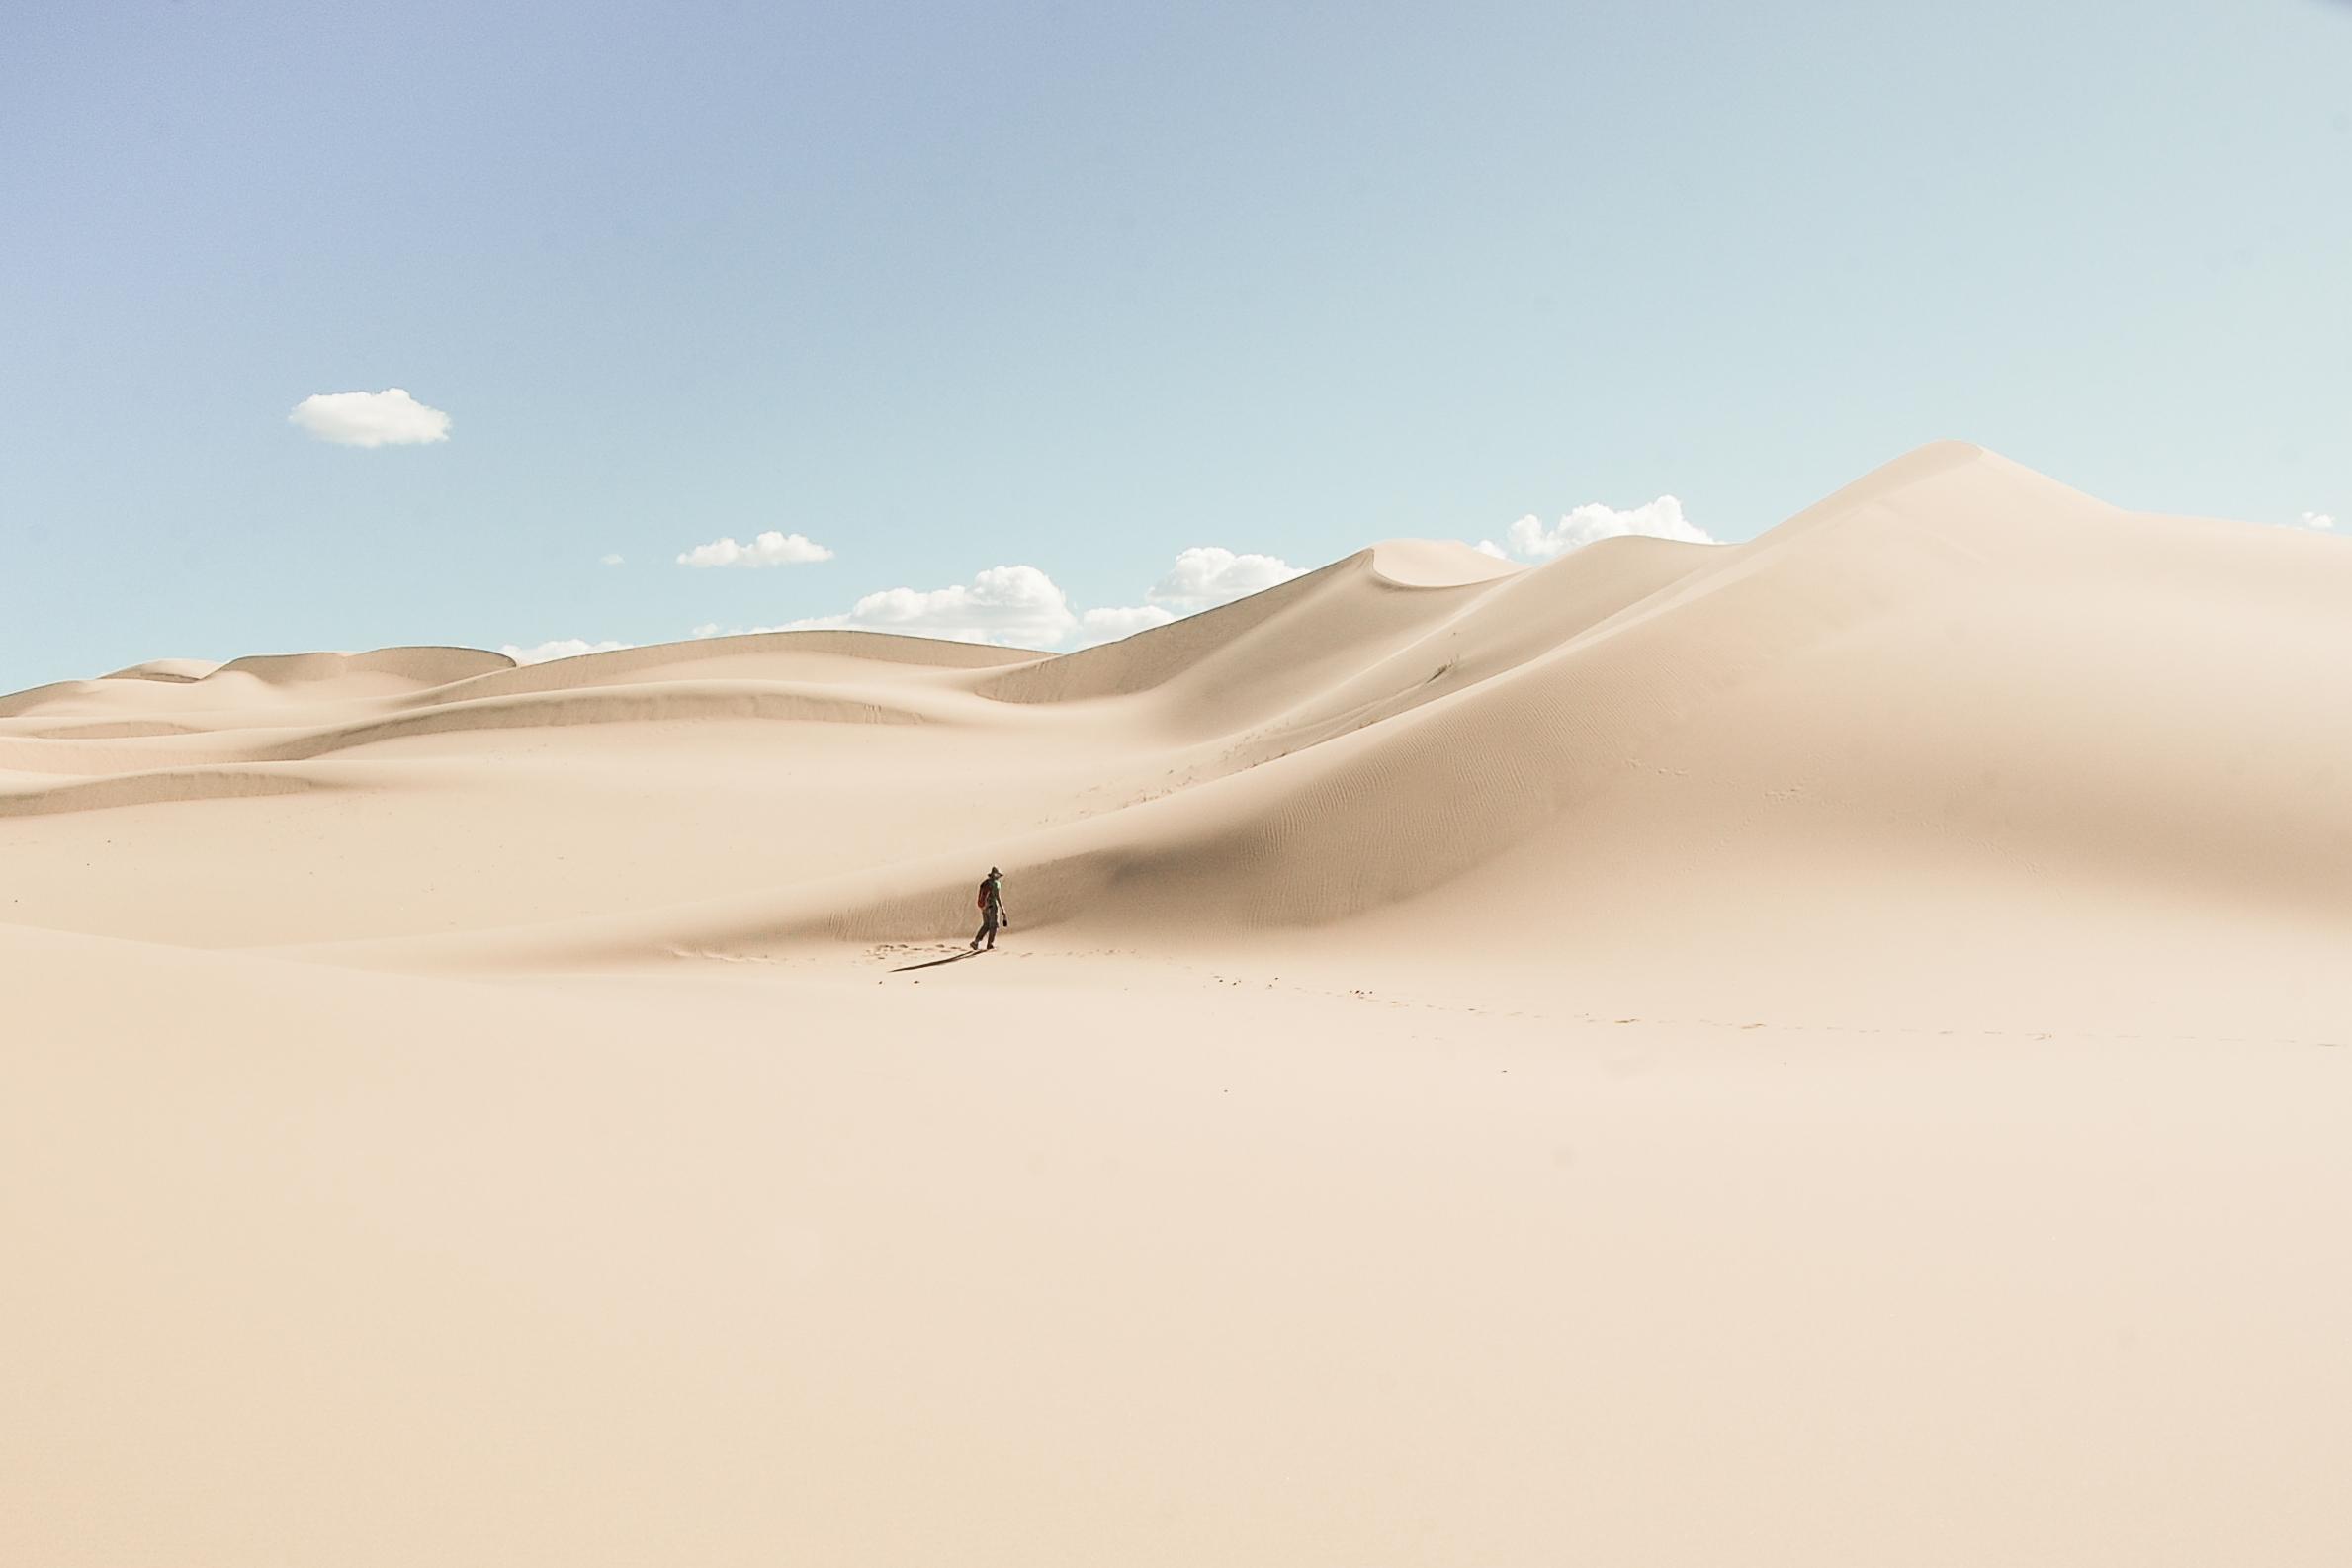 Walk alone, Gobi Desert, Mongolia 2010